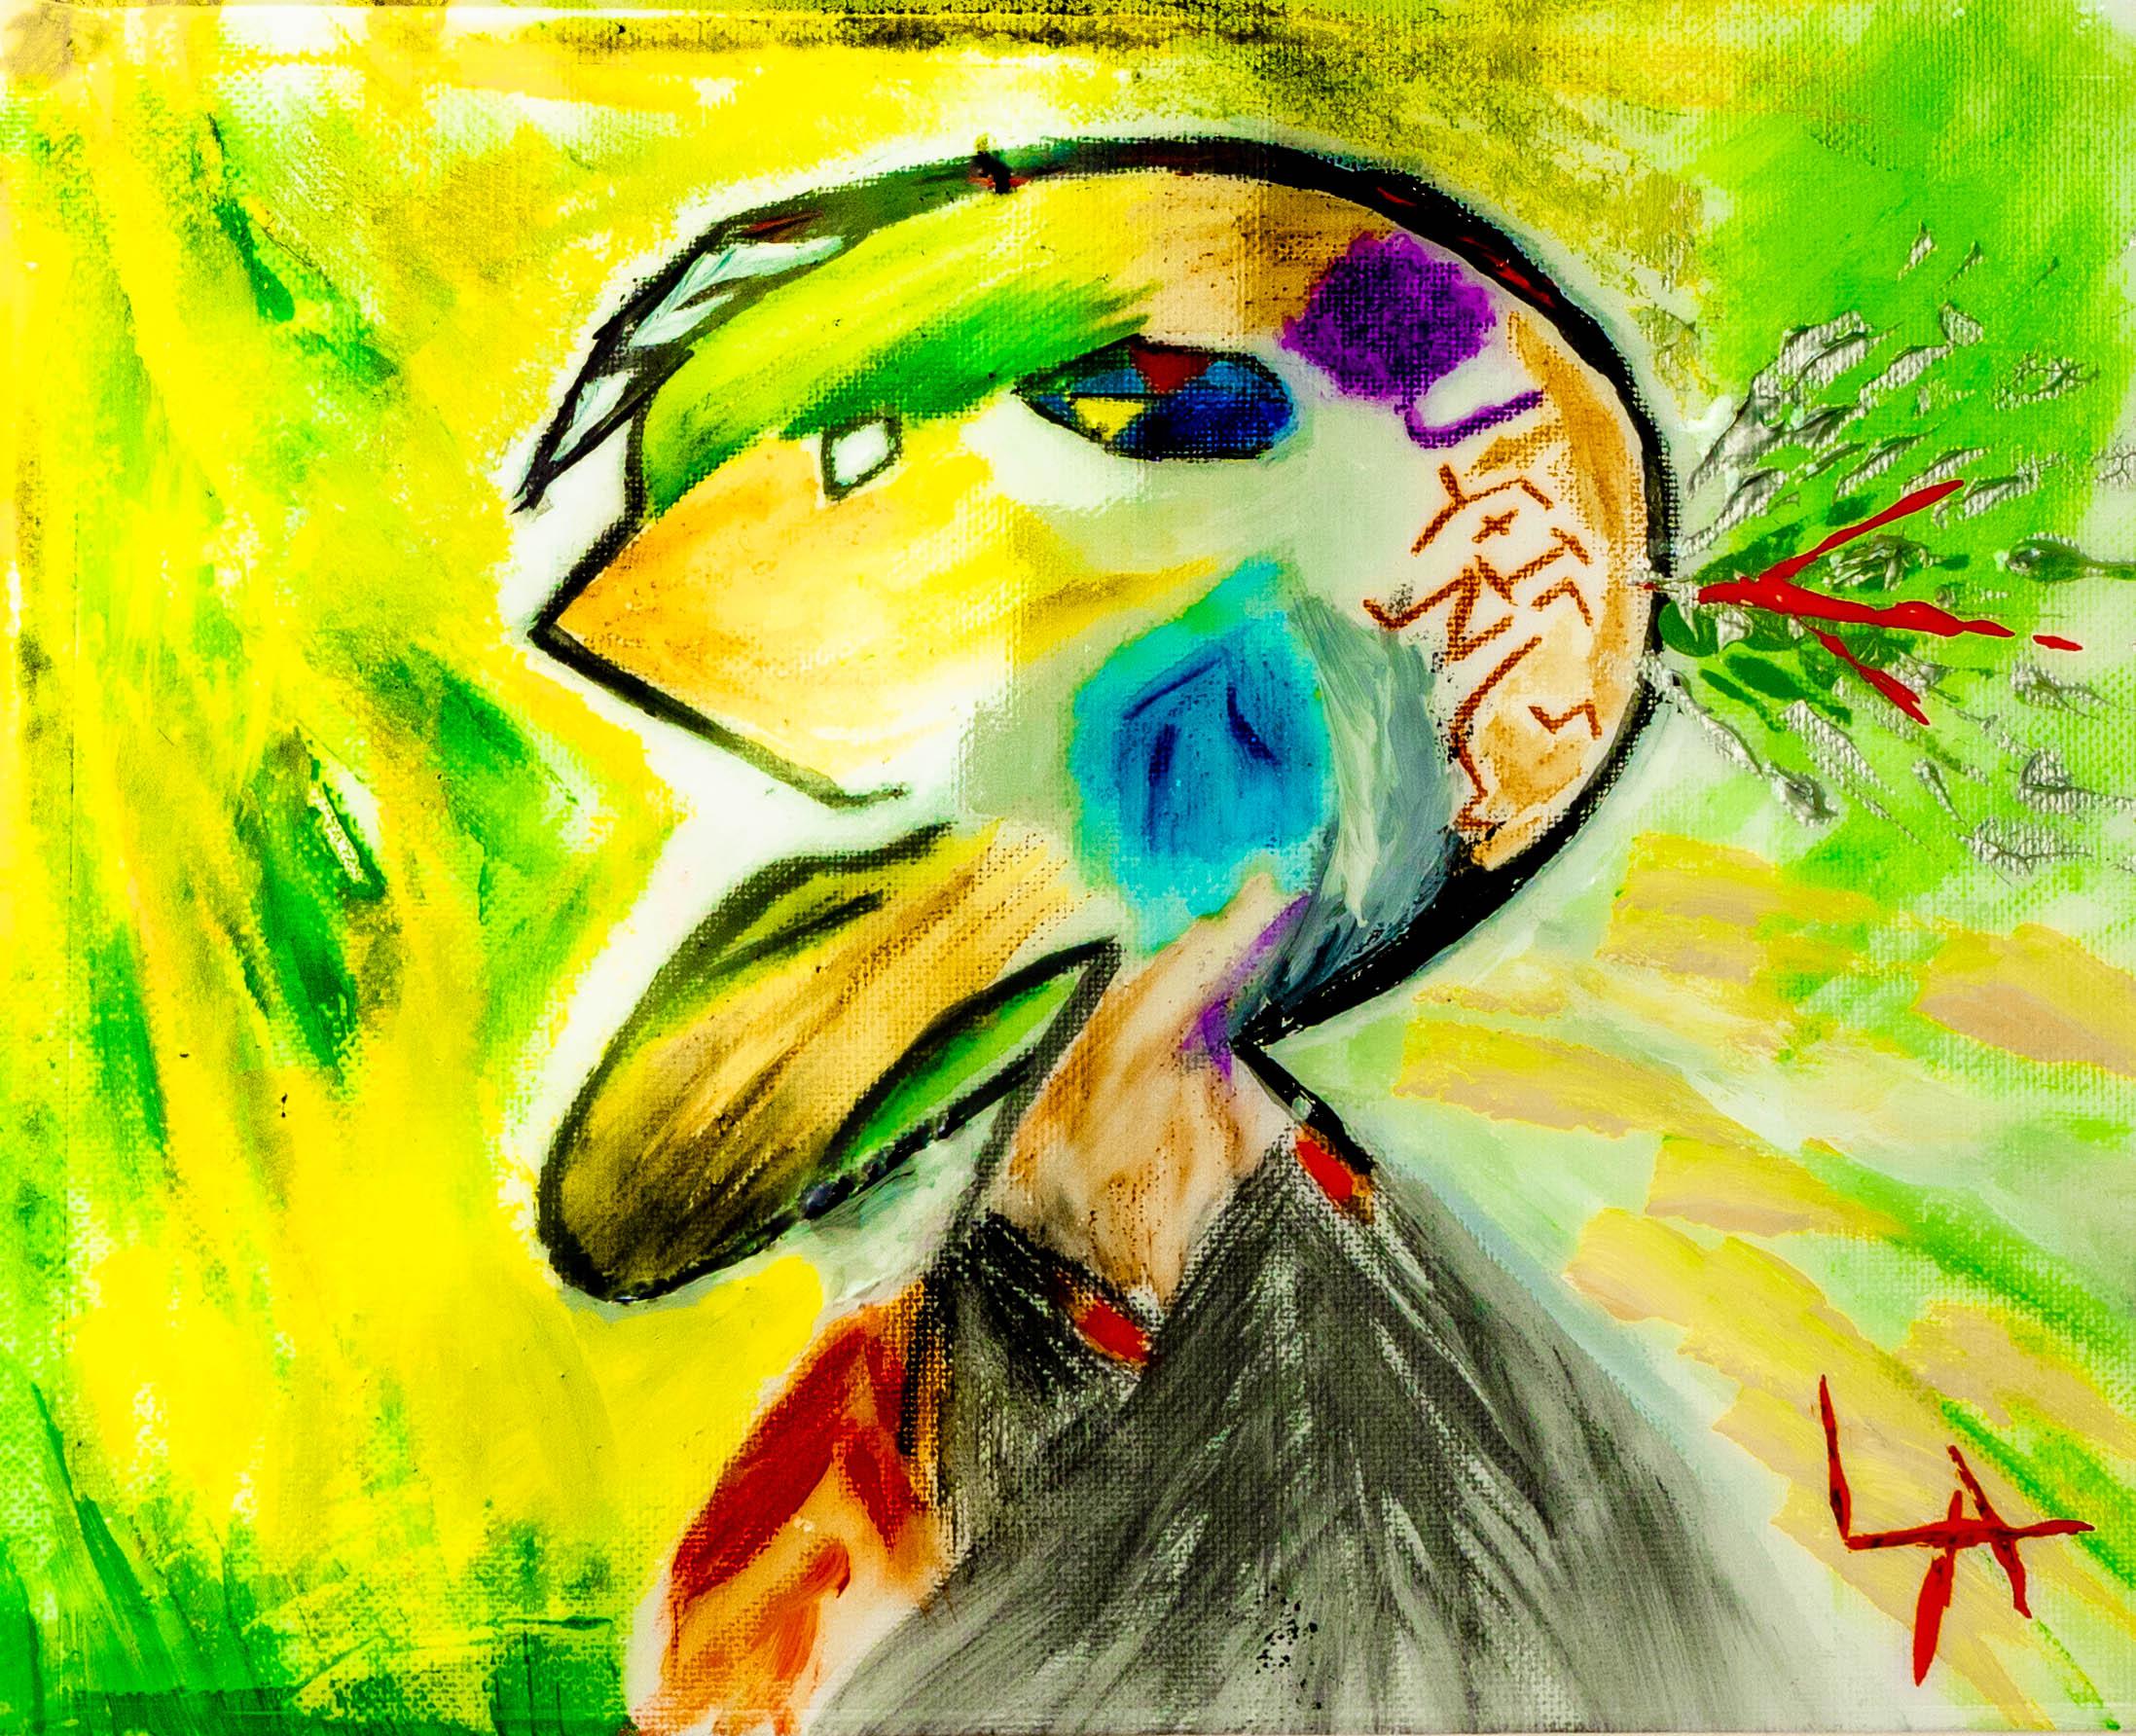 Louis Angel__Lime Juice__8_x10_ Canvas_Watercolors_Acrylic_Resin_2019_$250.jpg